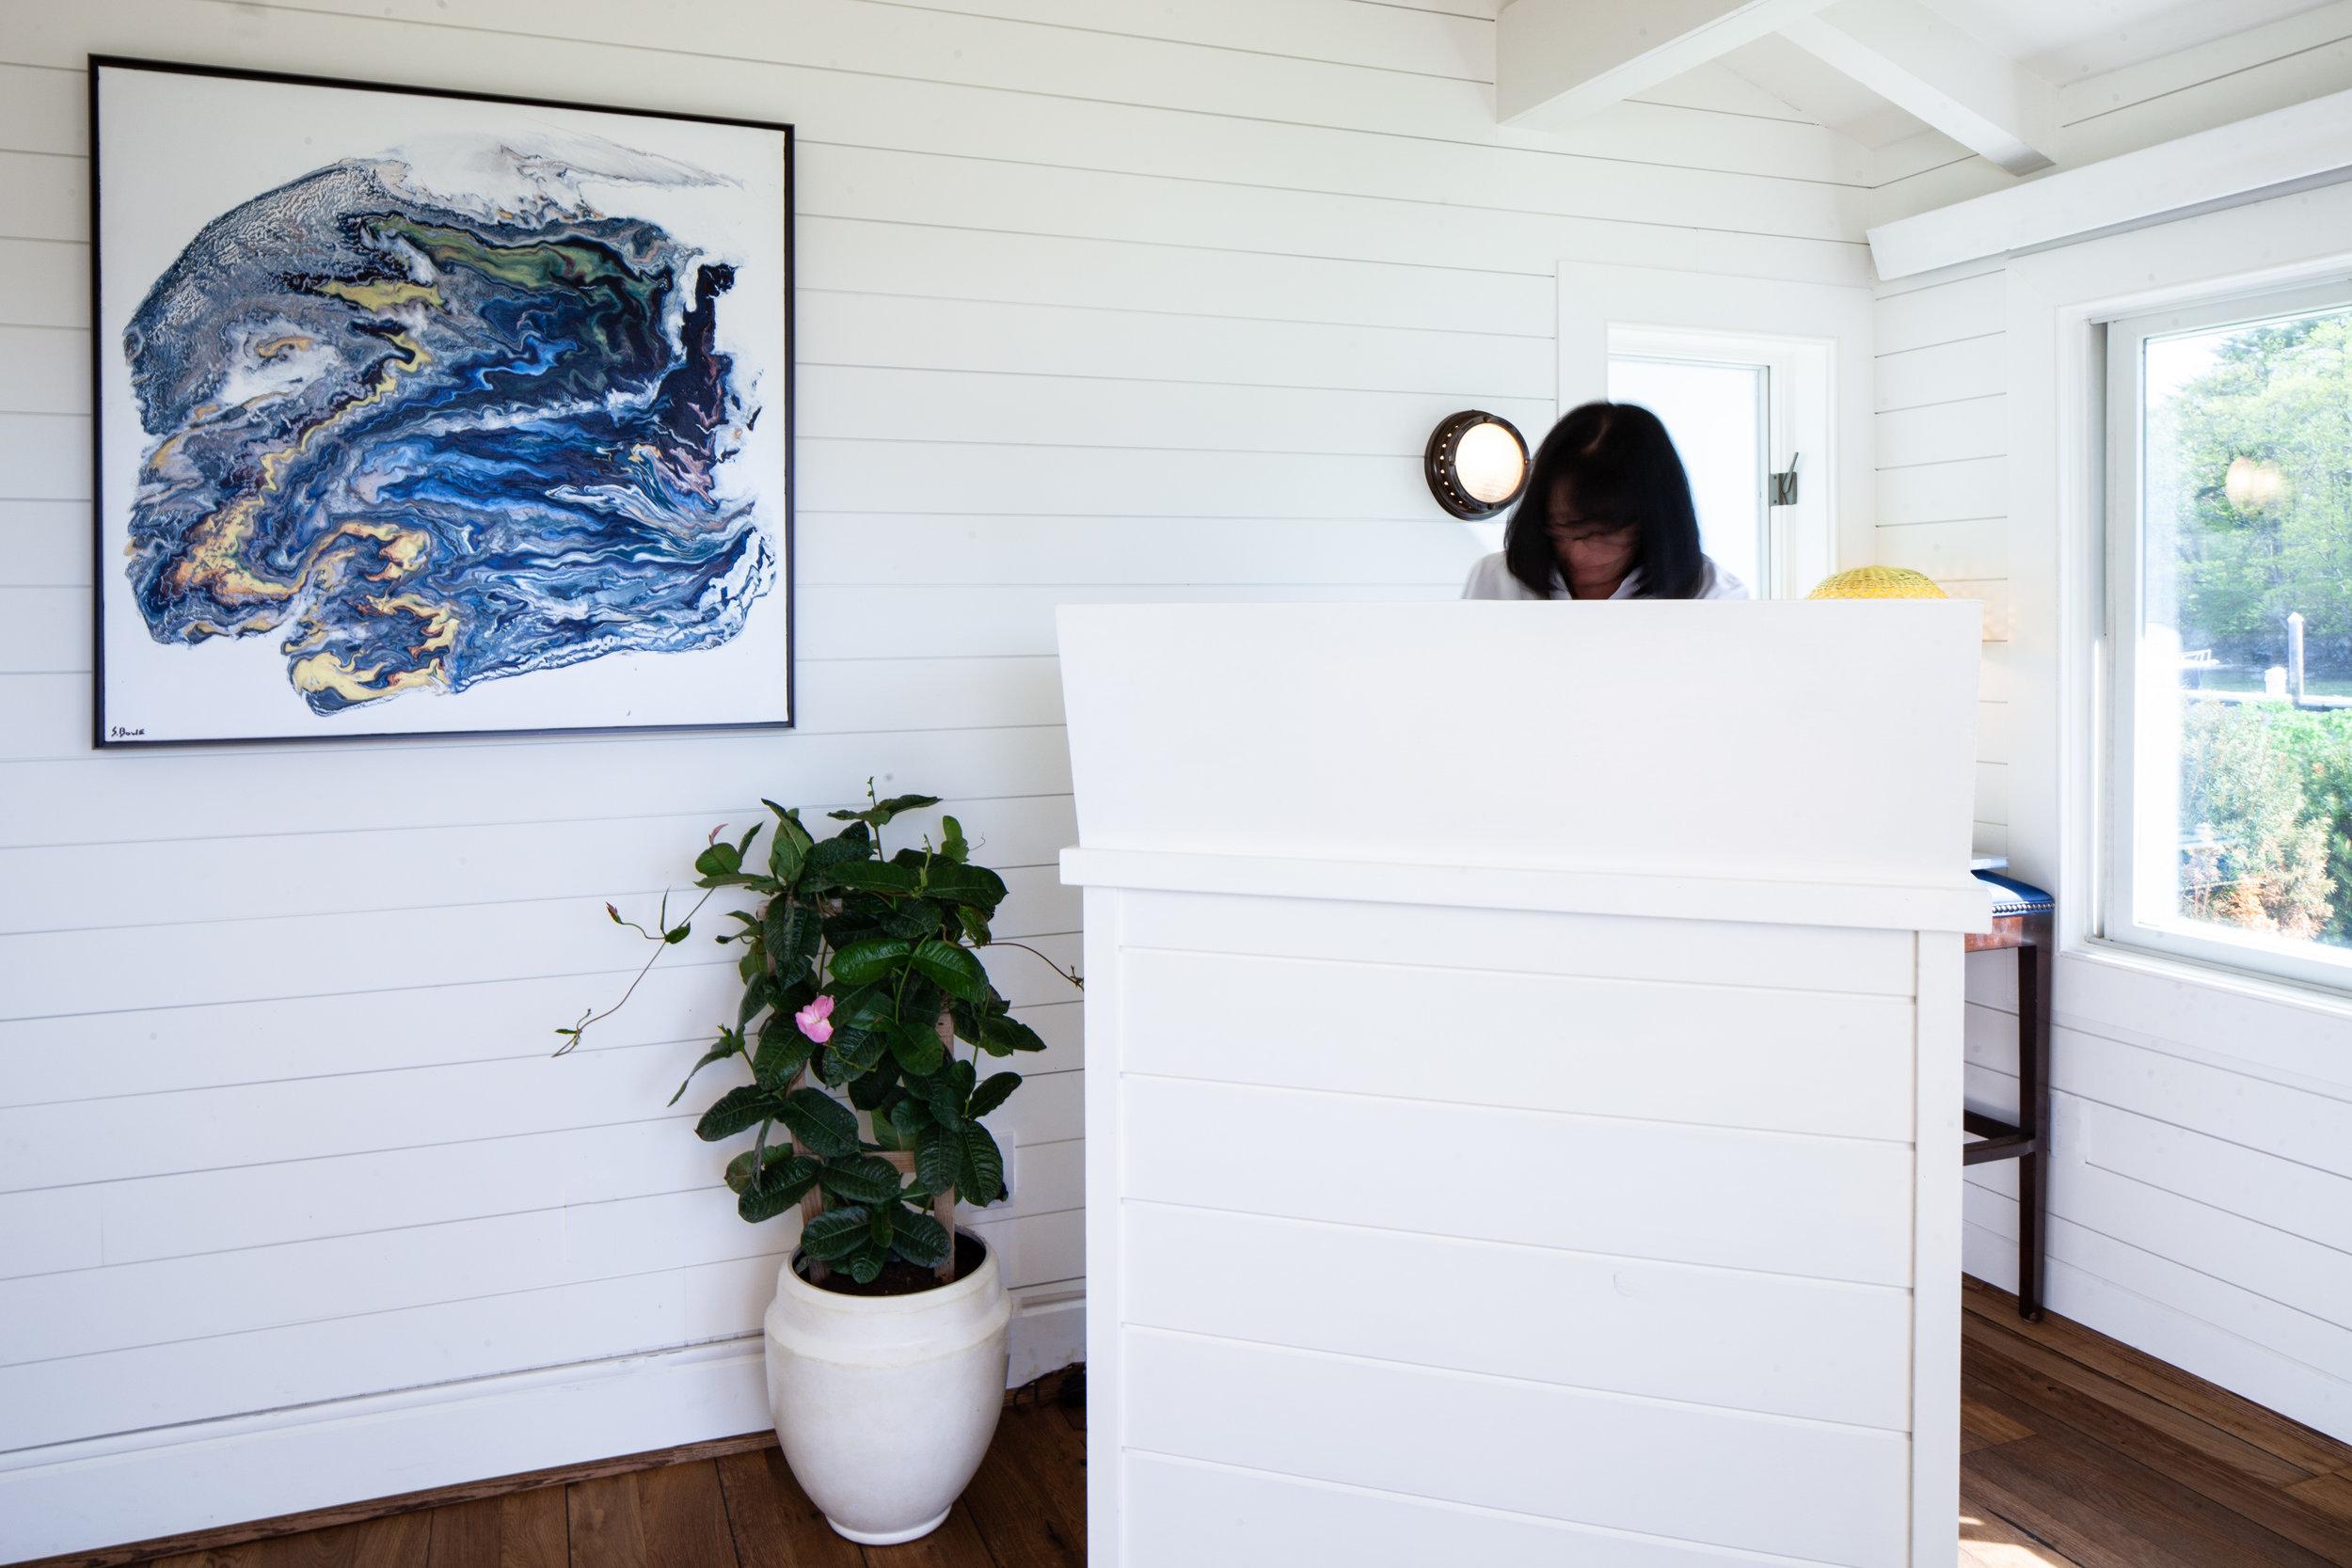 Scott Bowe Artist Yachtsman and Marina Hotel Kennebunkport Maine Heidi Kirn Photography.jpg